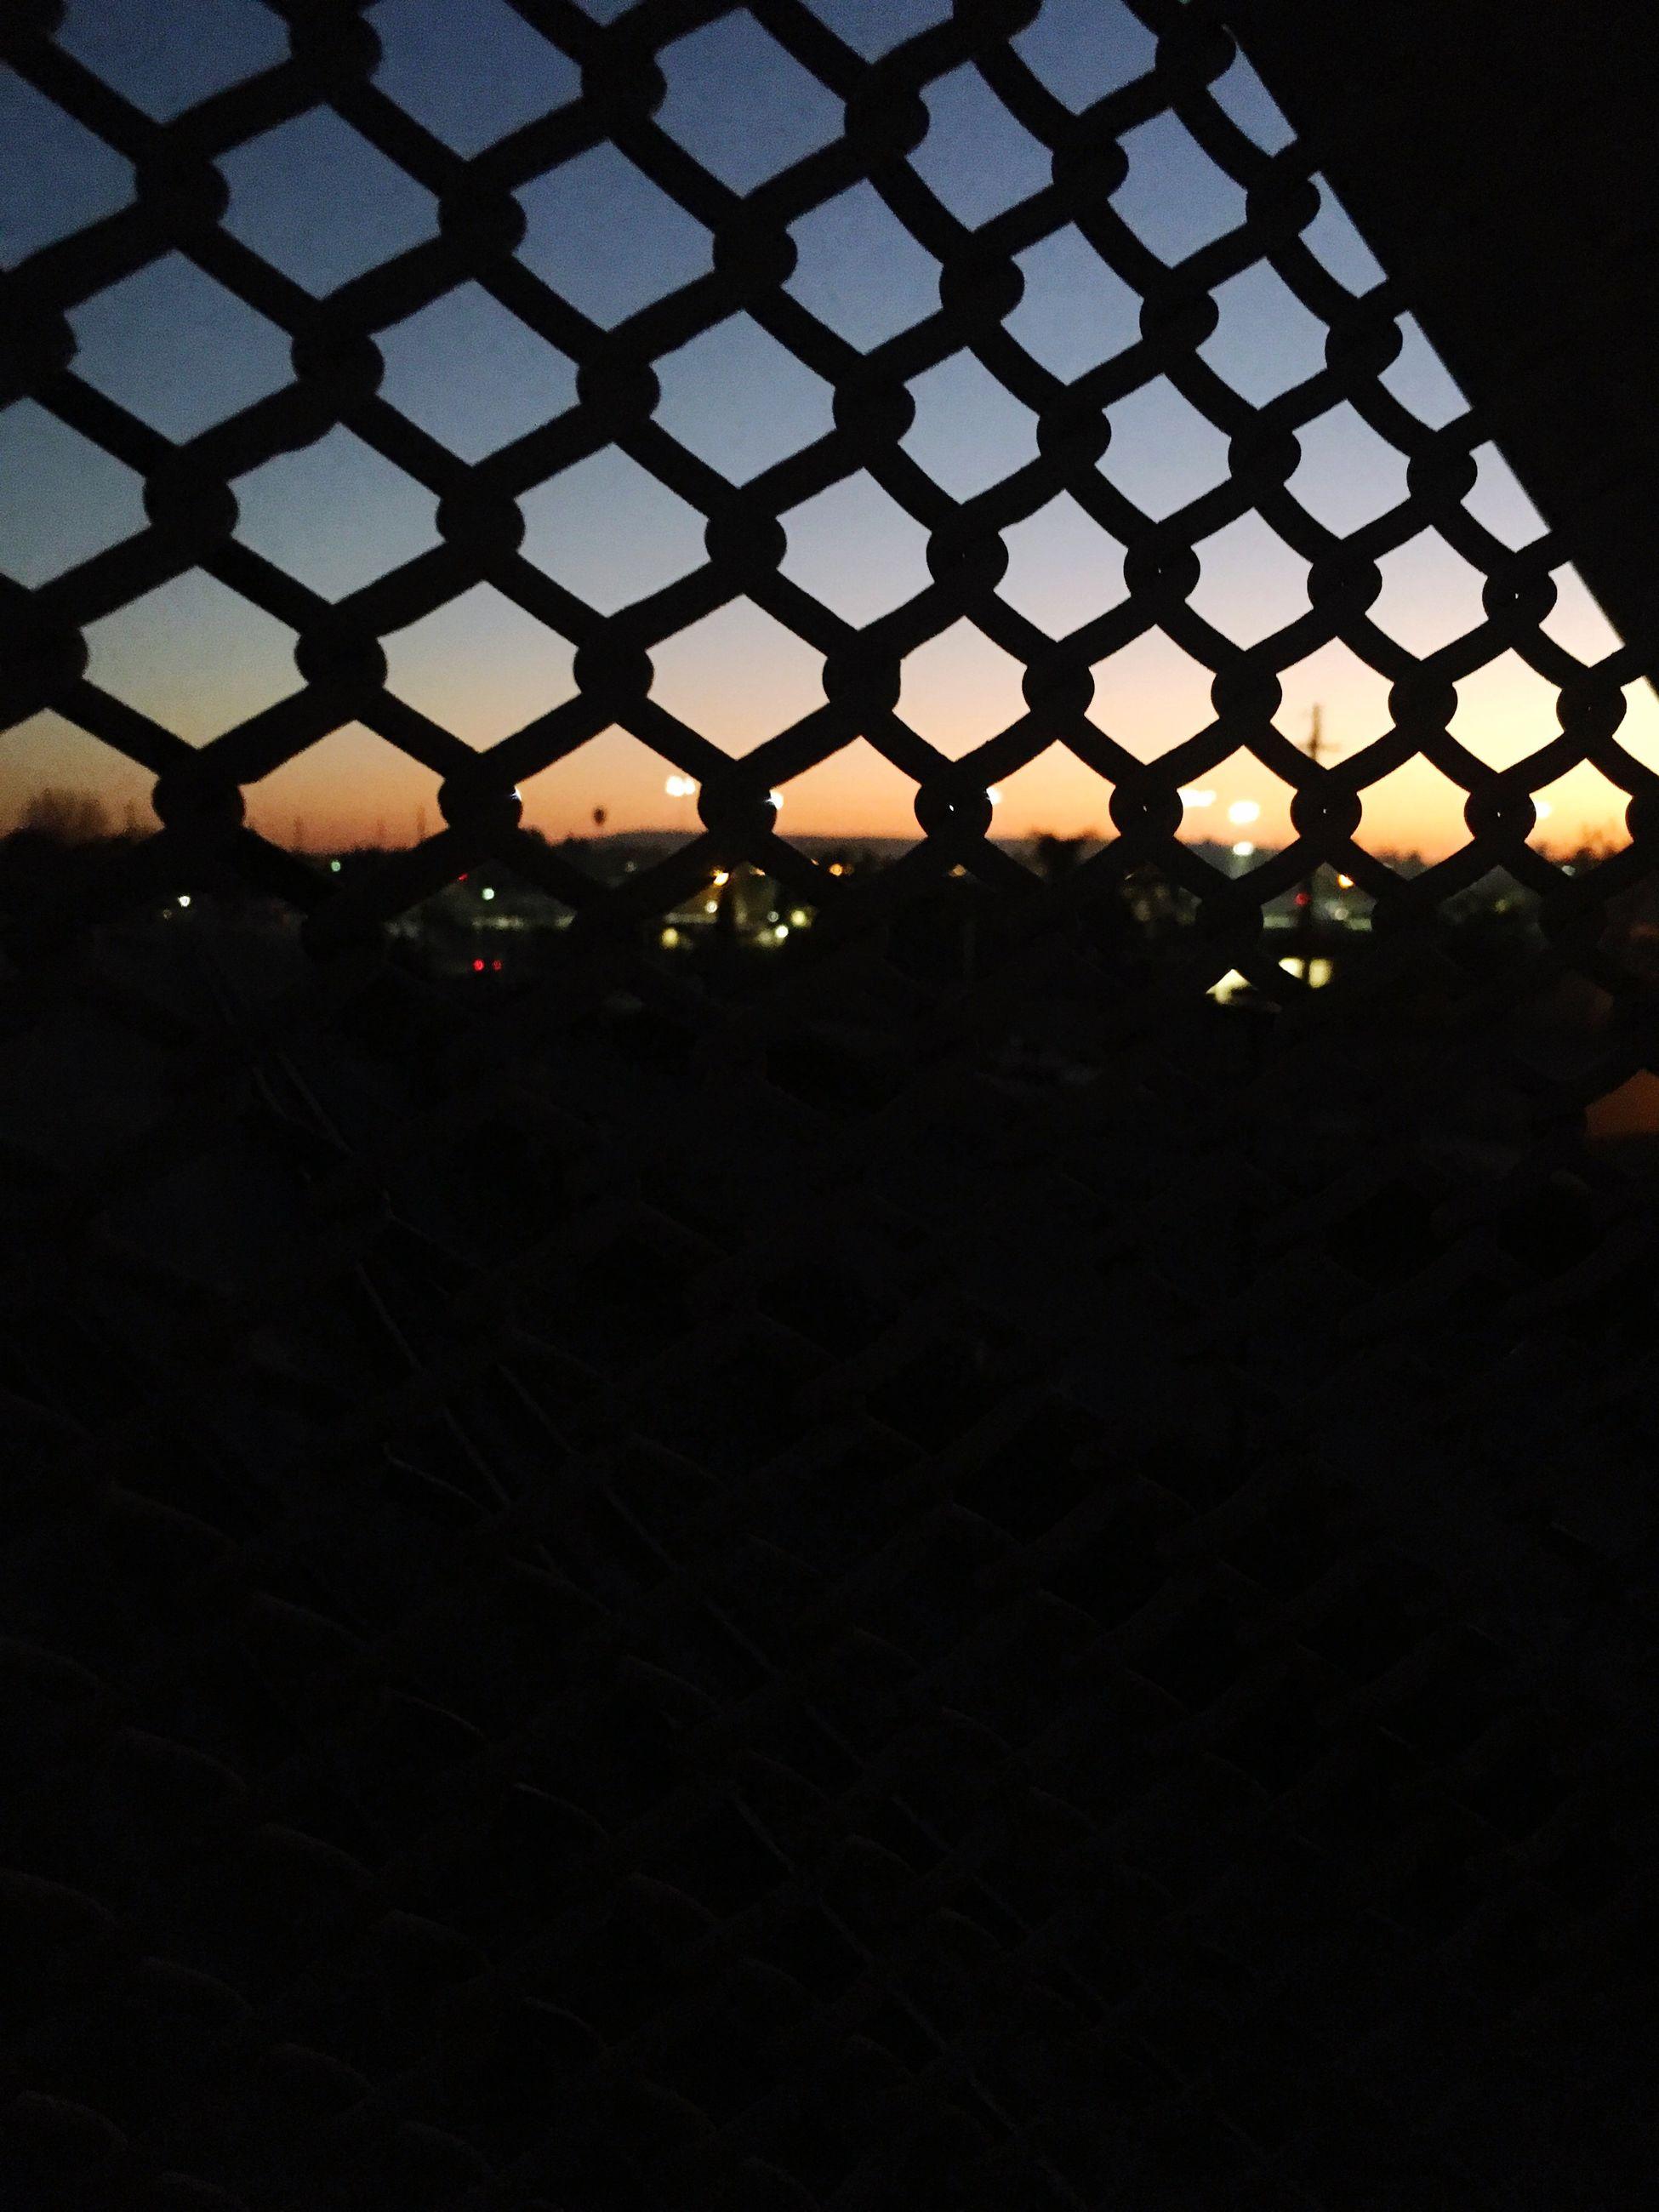 illuminated, night, sunset, silhouette, built structure, architecture, dark, pattern, building exterior, indoors, no people, orange color, sky, dusk, city, lighting equipment, light - natural phenomenon, shadow, metal